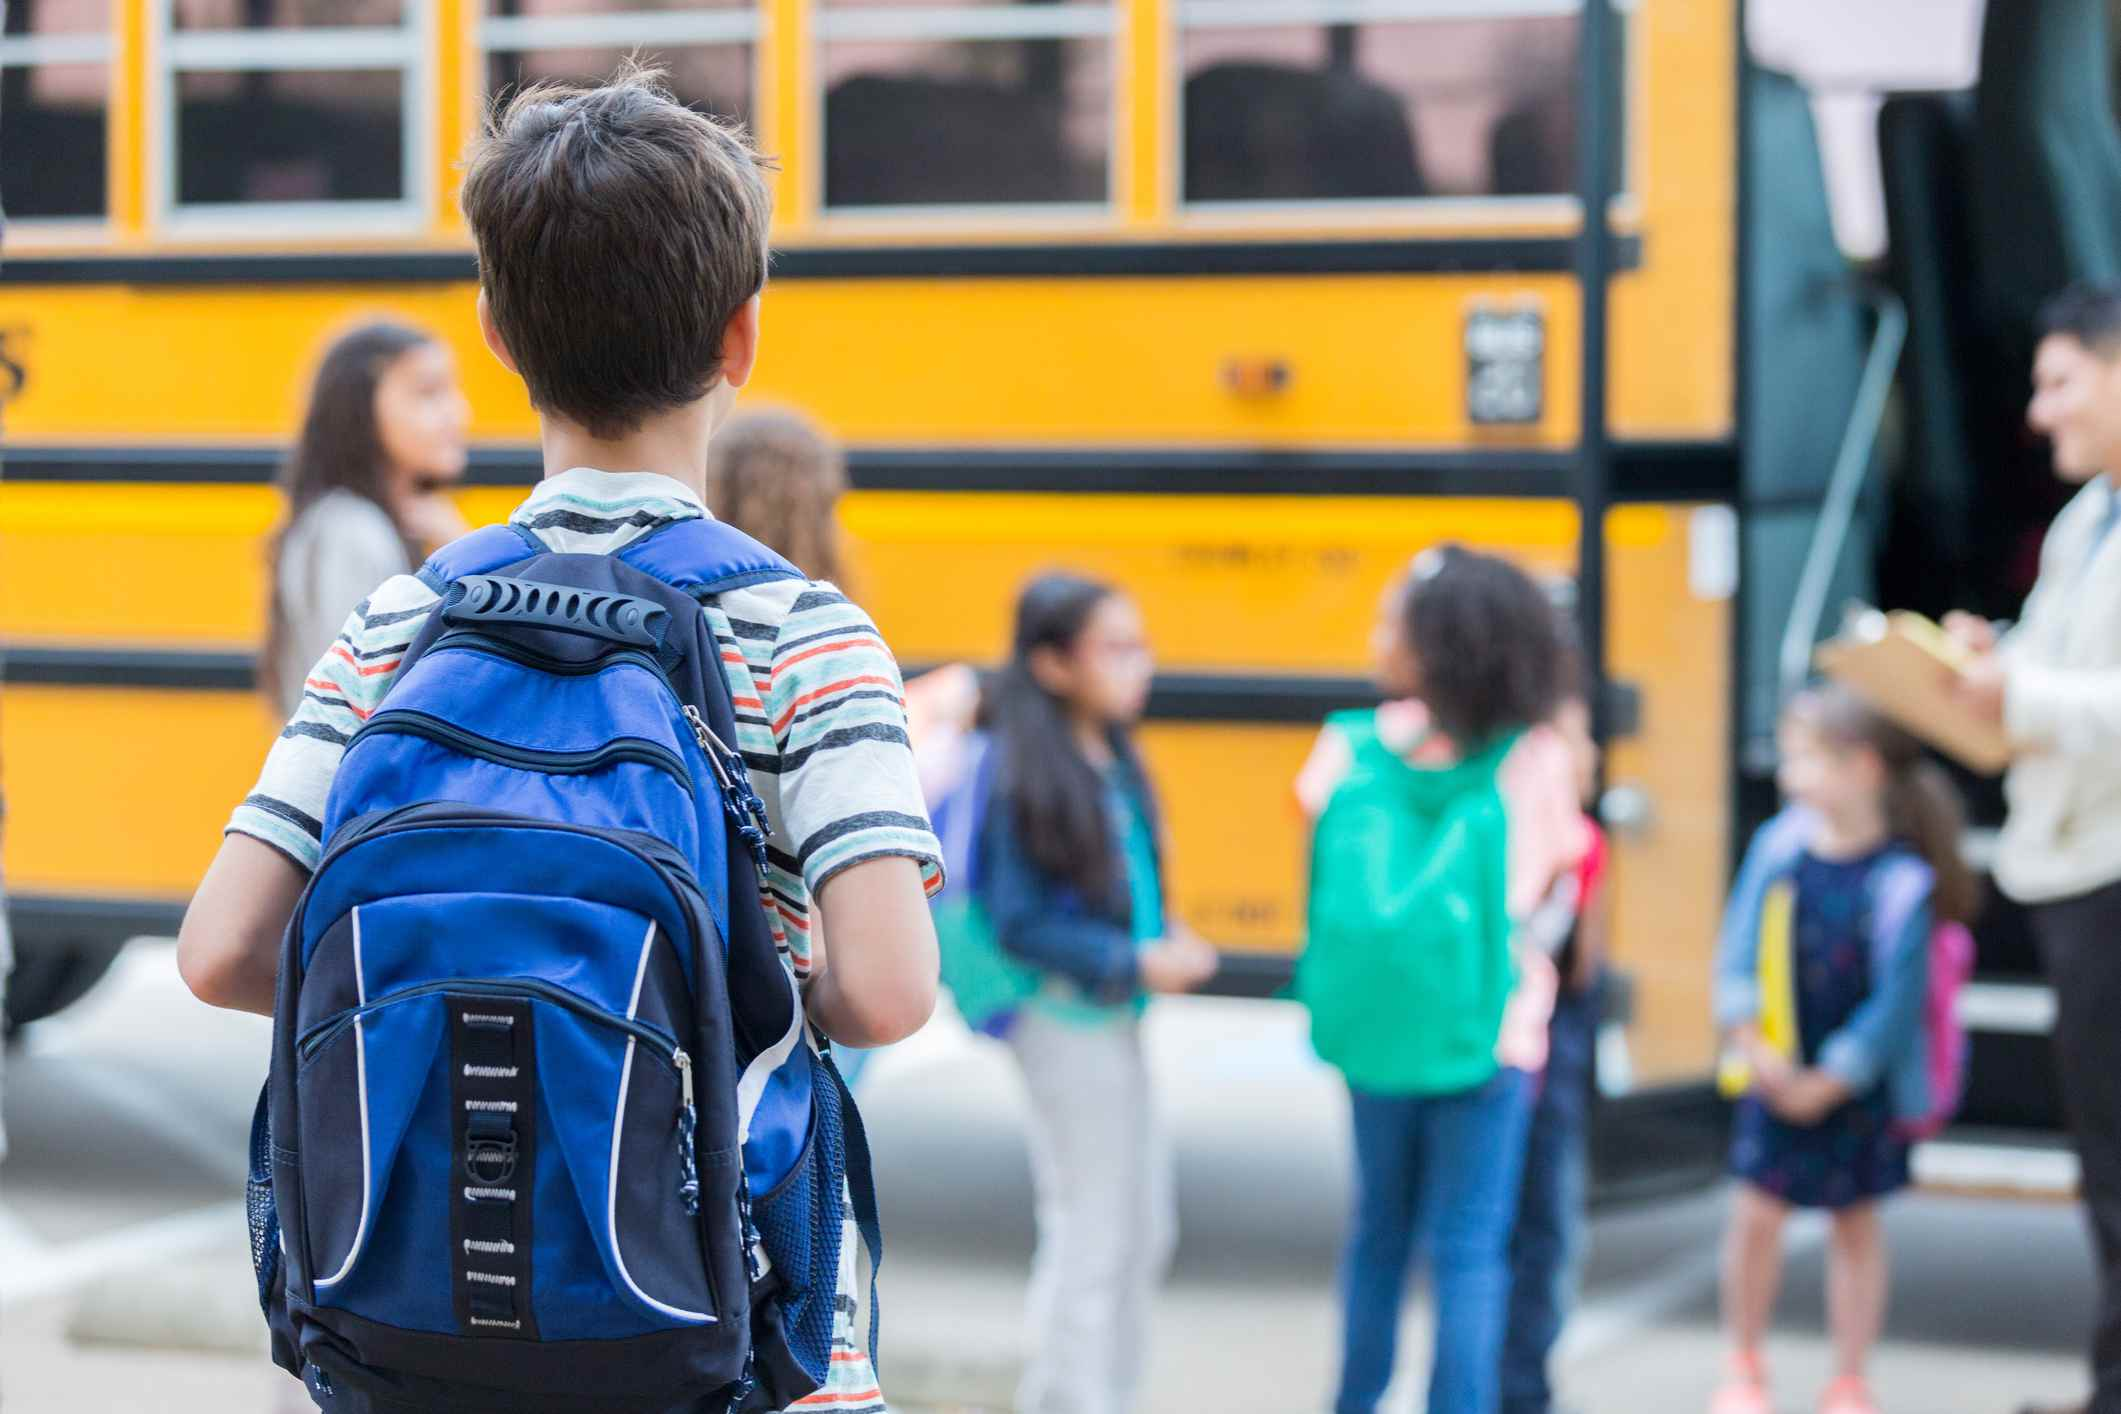 Niño esperando para subir al bus escolar